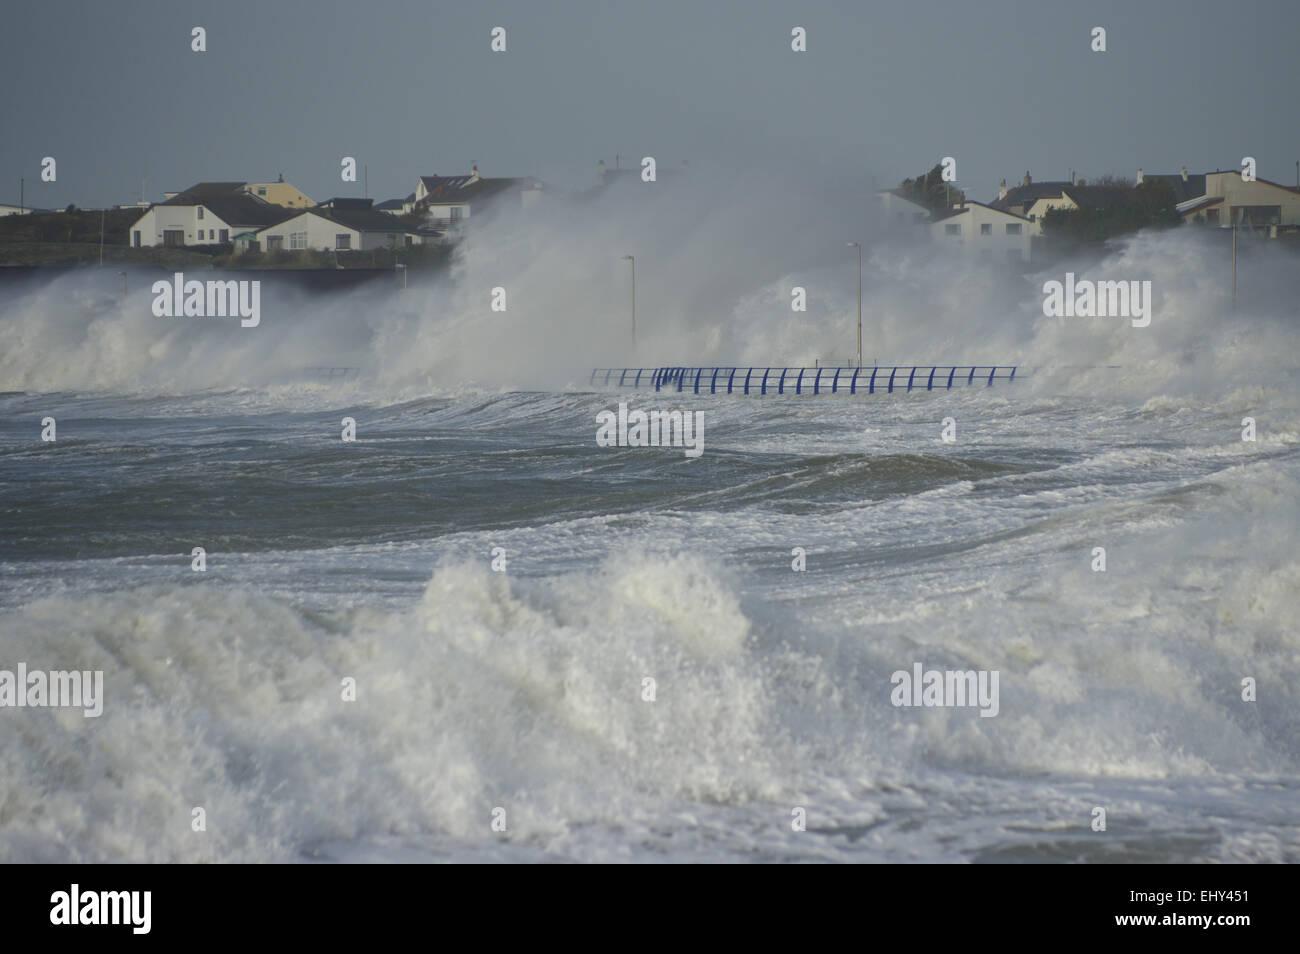 Promenade, Trearddur Bay, Anglesey,  Stormy Sea - Stock Image